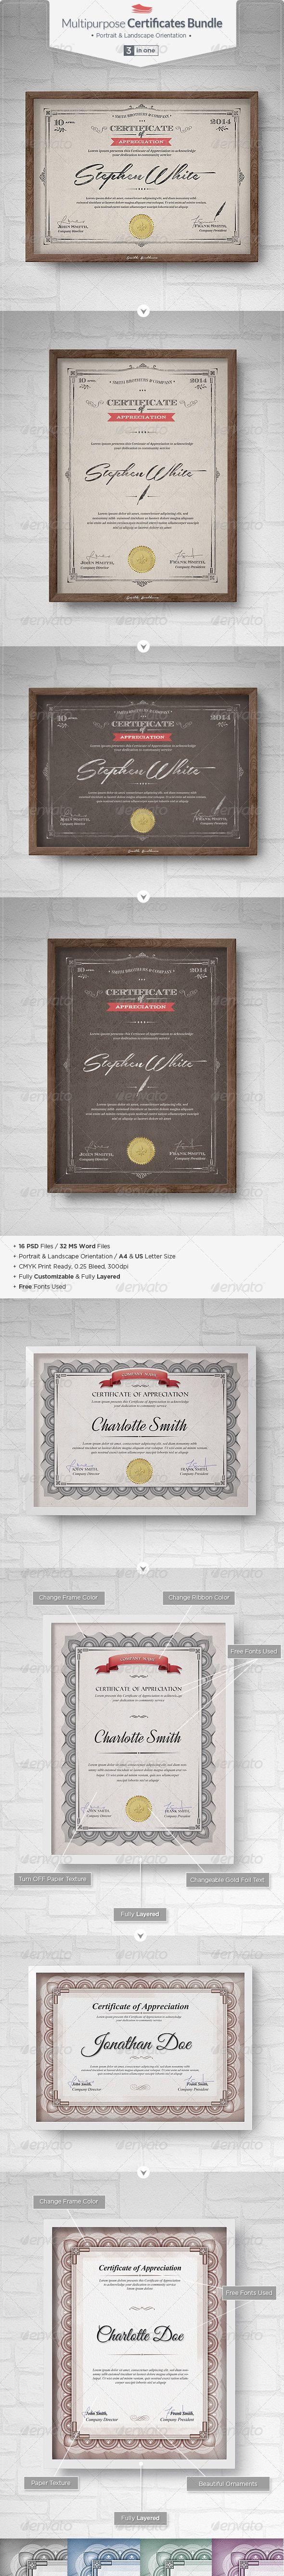 Multipurpose Certificates Bundle - Certificates Stationery. DOWNLOAD : http://graphicriver.net/item/multipurpose-certificates-bundle/7230729?ref=sinzo